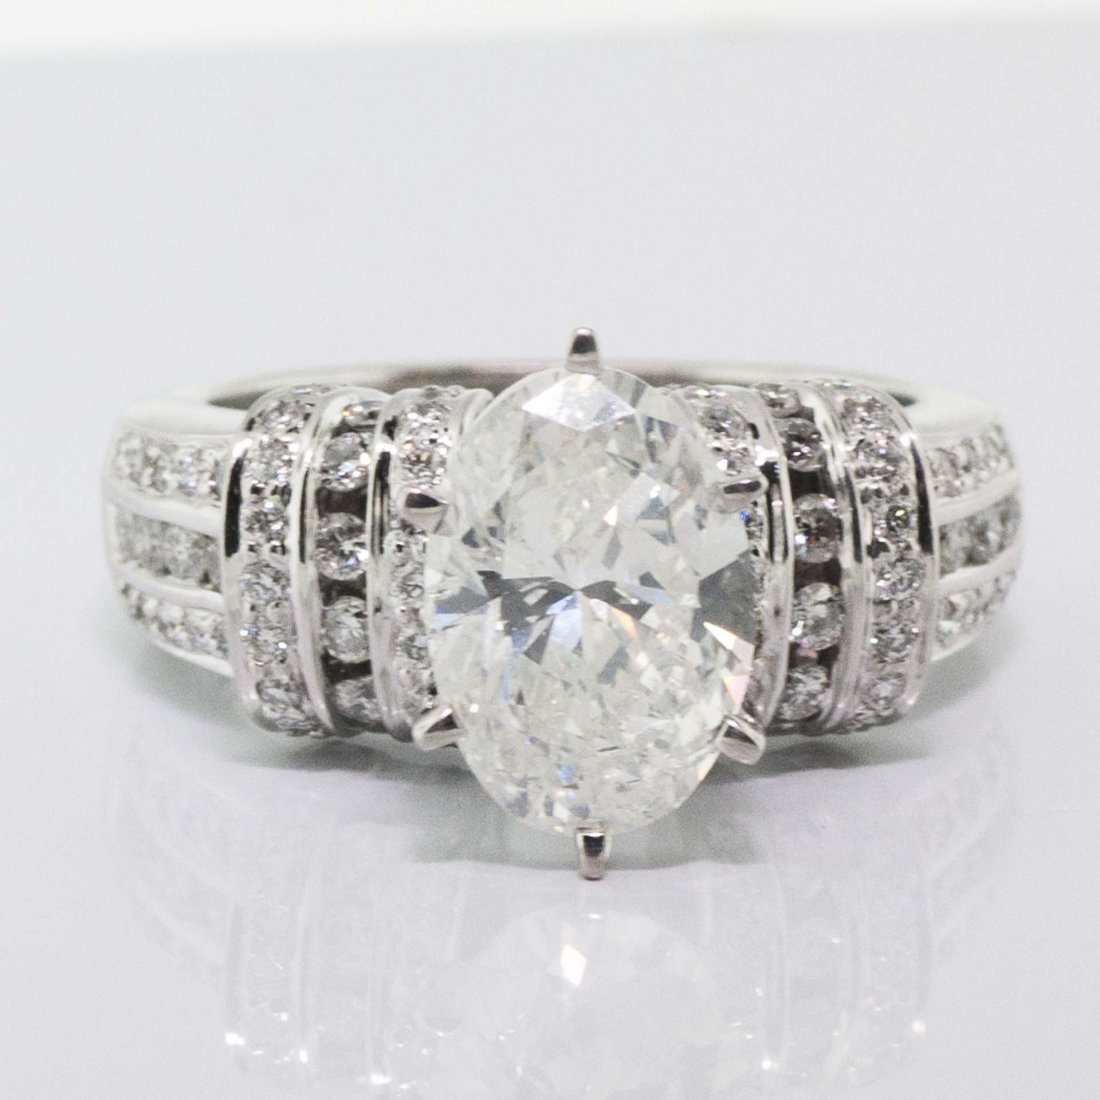 IGI CERTIFIED F SI1 3.01CT CENTER DIAMOND 4.01TW RING